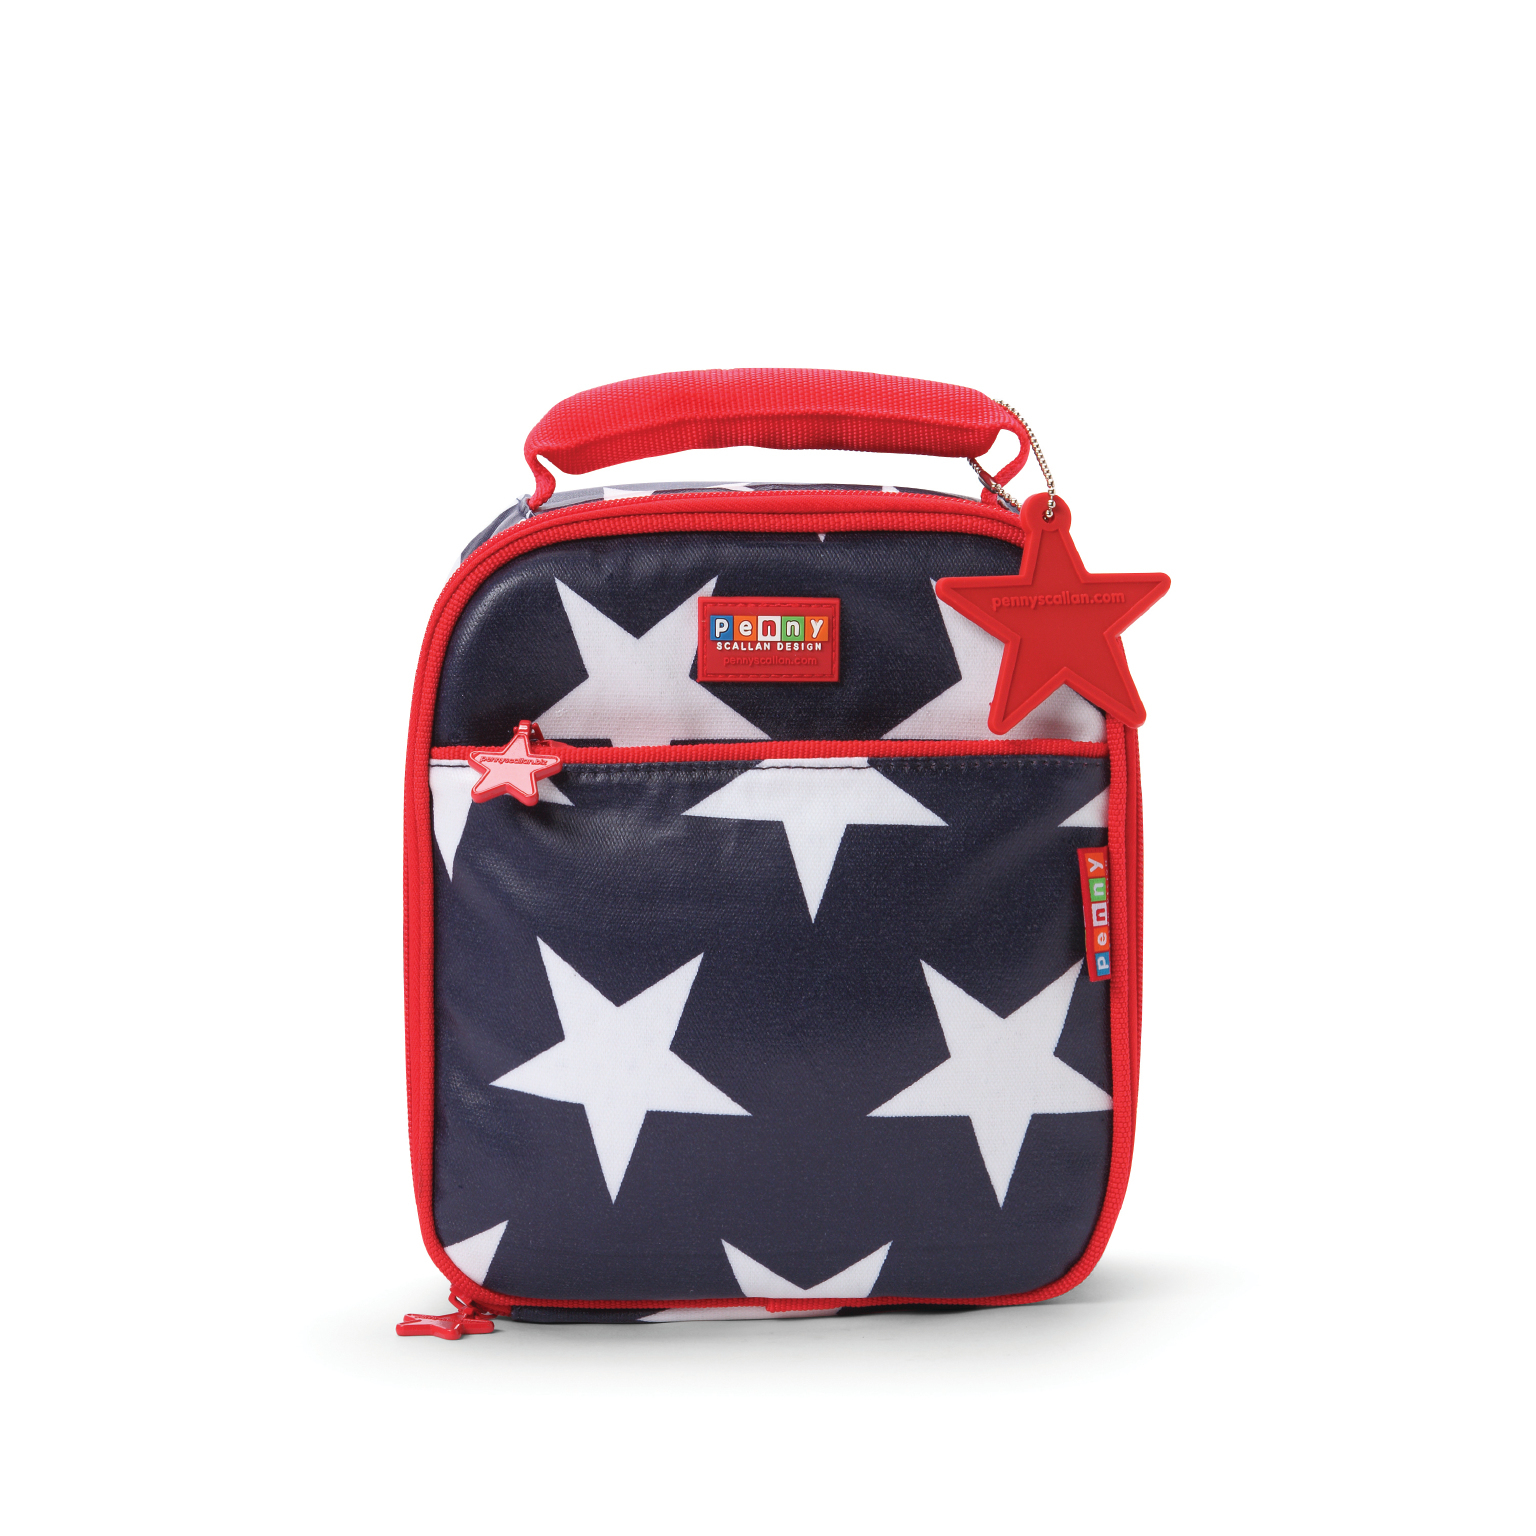 Navy Star School Lunchbox image